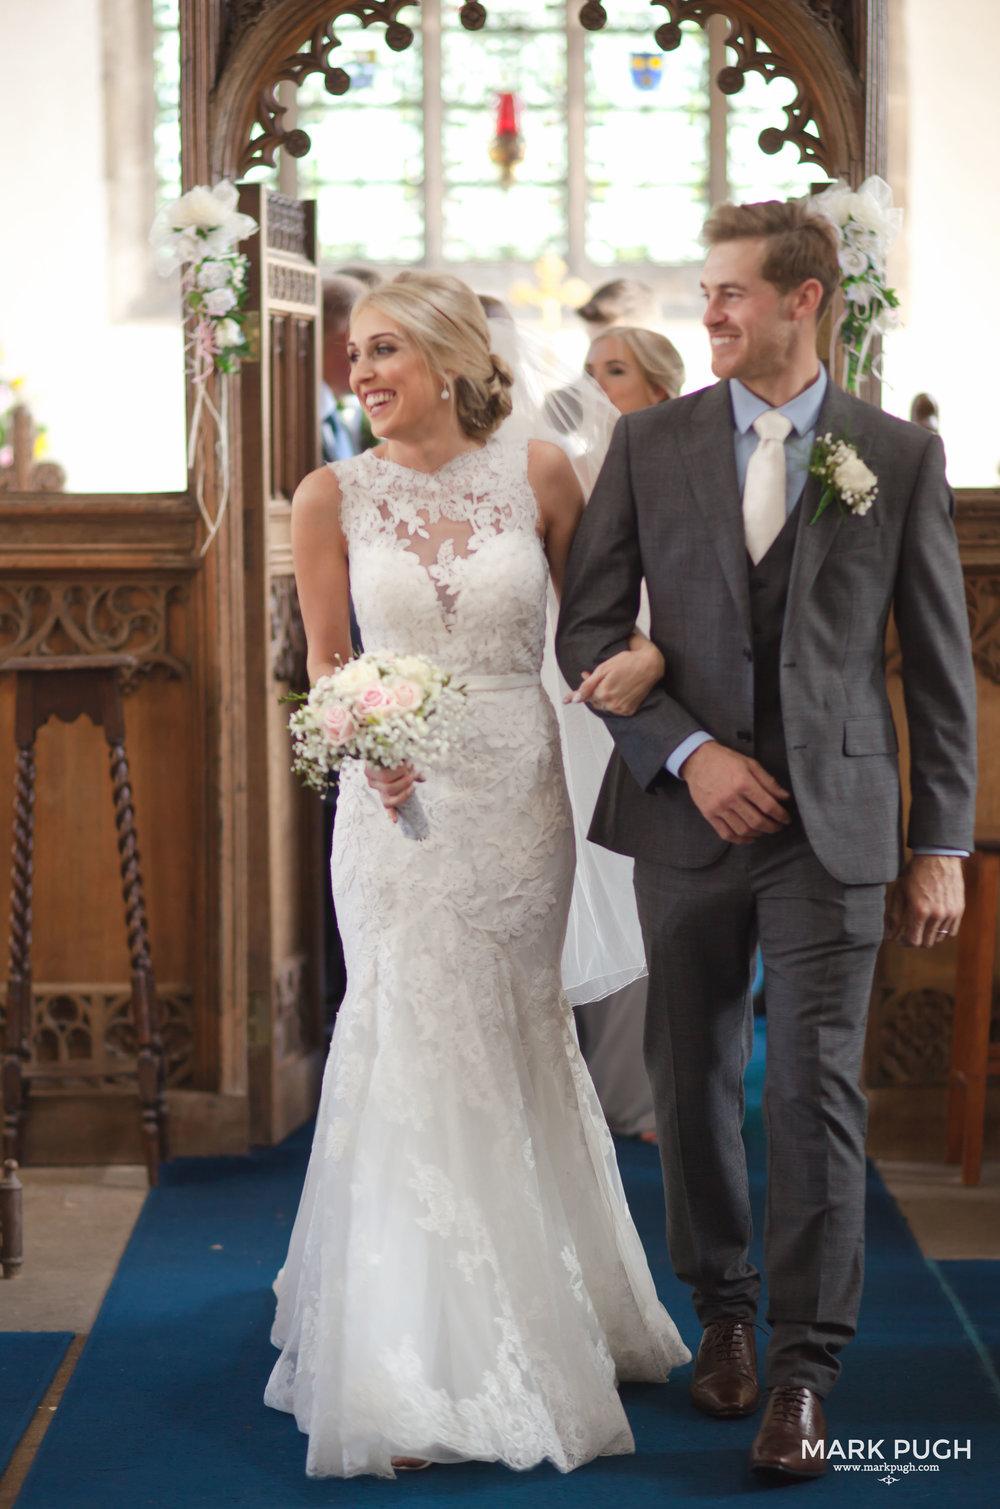 058 - Lucy and  Steven fineART wedding photography by www.markpugh.com Mark Pugh of www.mpmedia.co.uk_.JPG